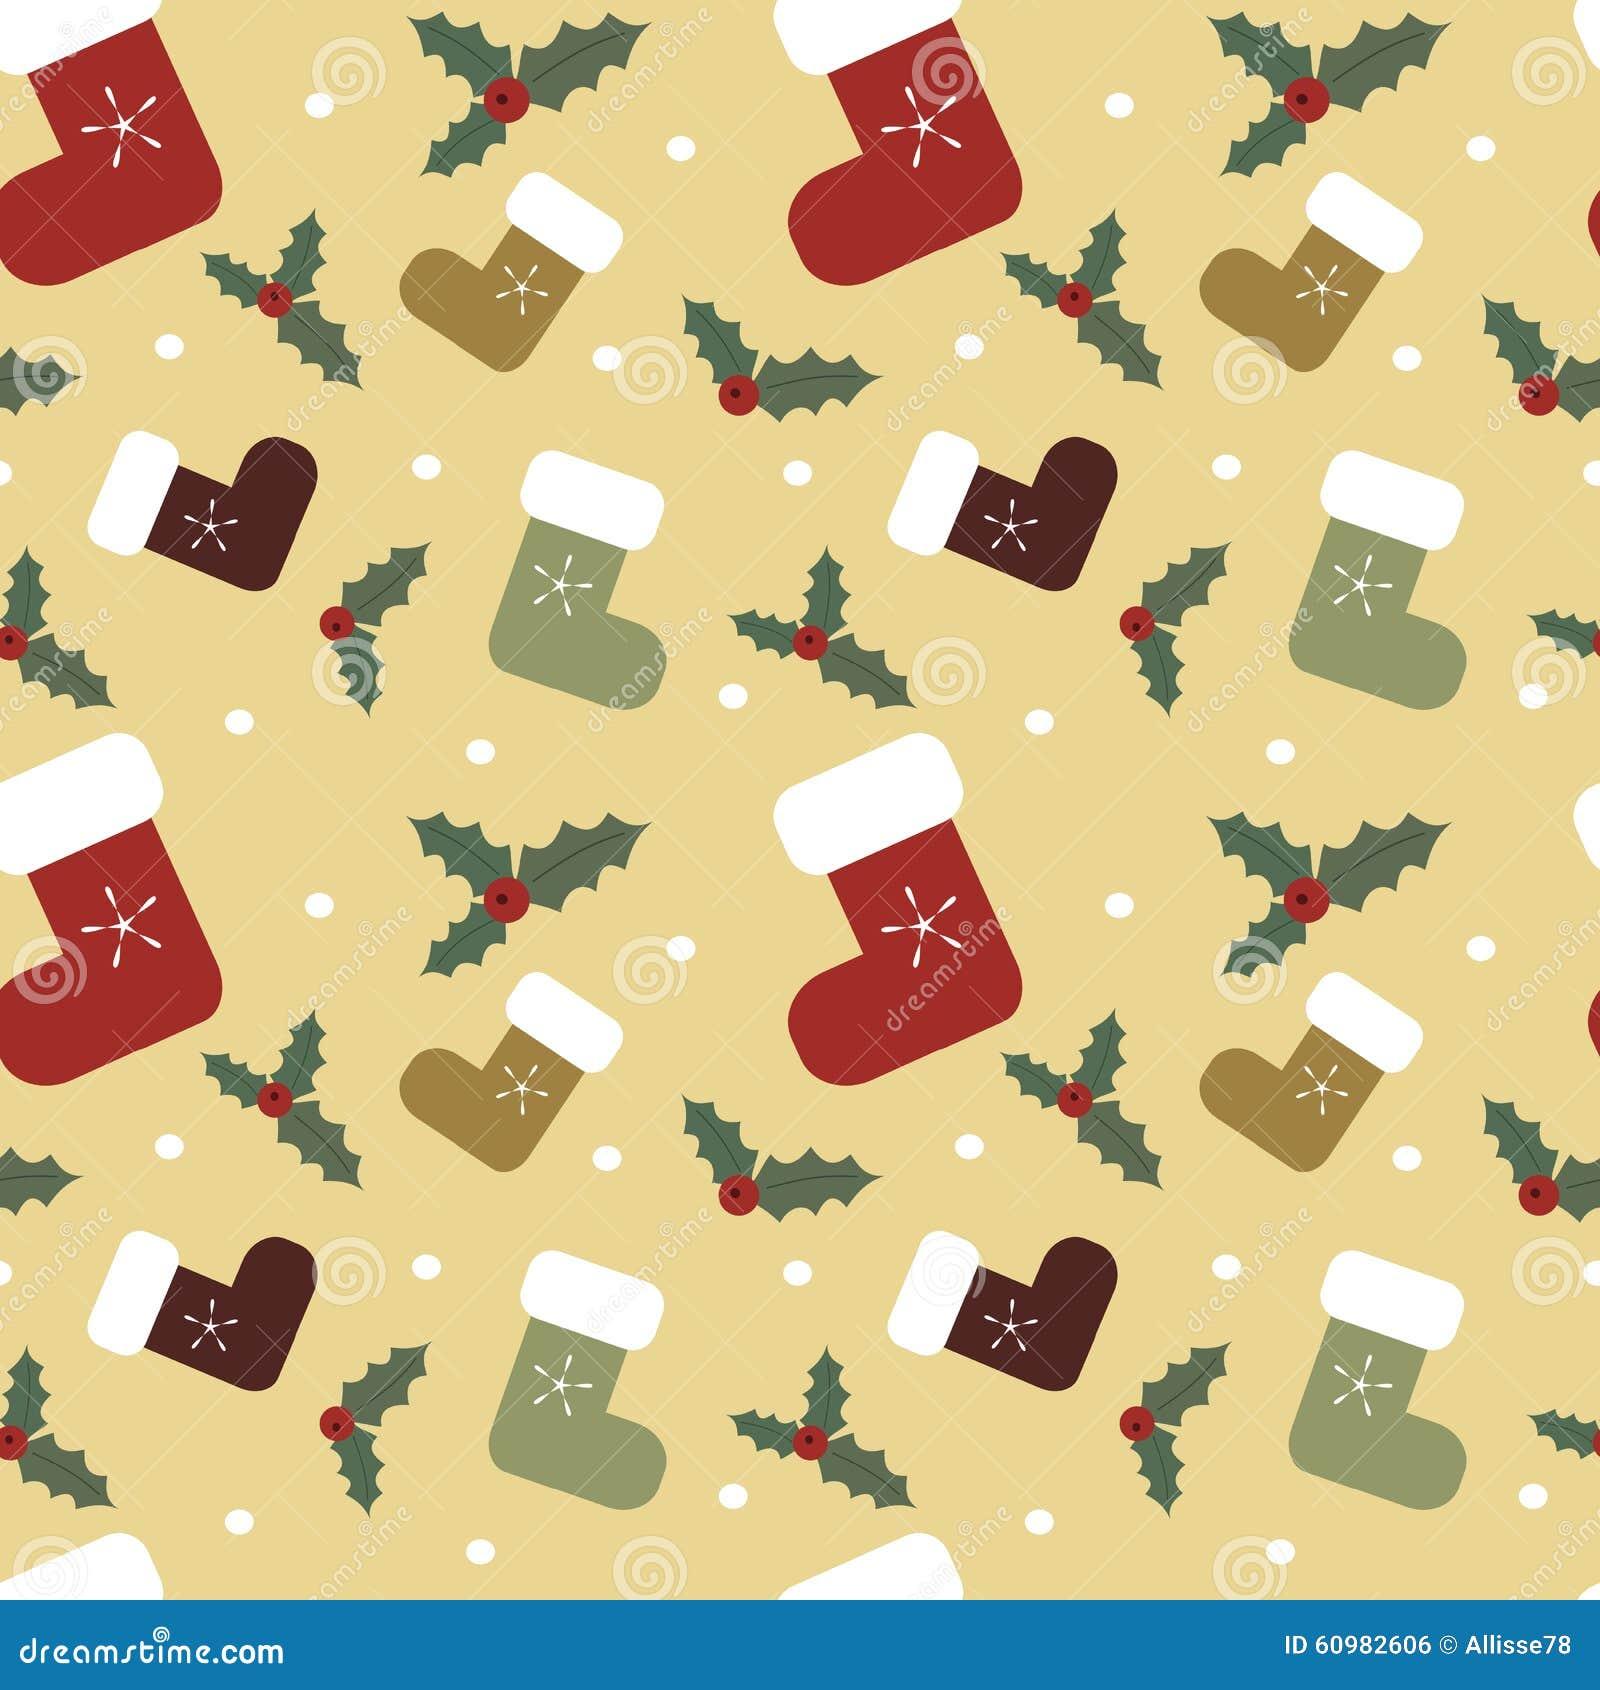 christmas cartoon colorful socks seamless pattern background